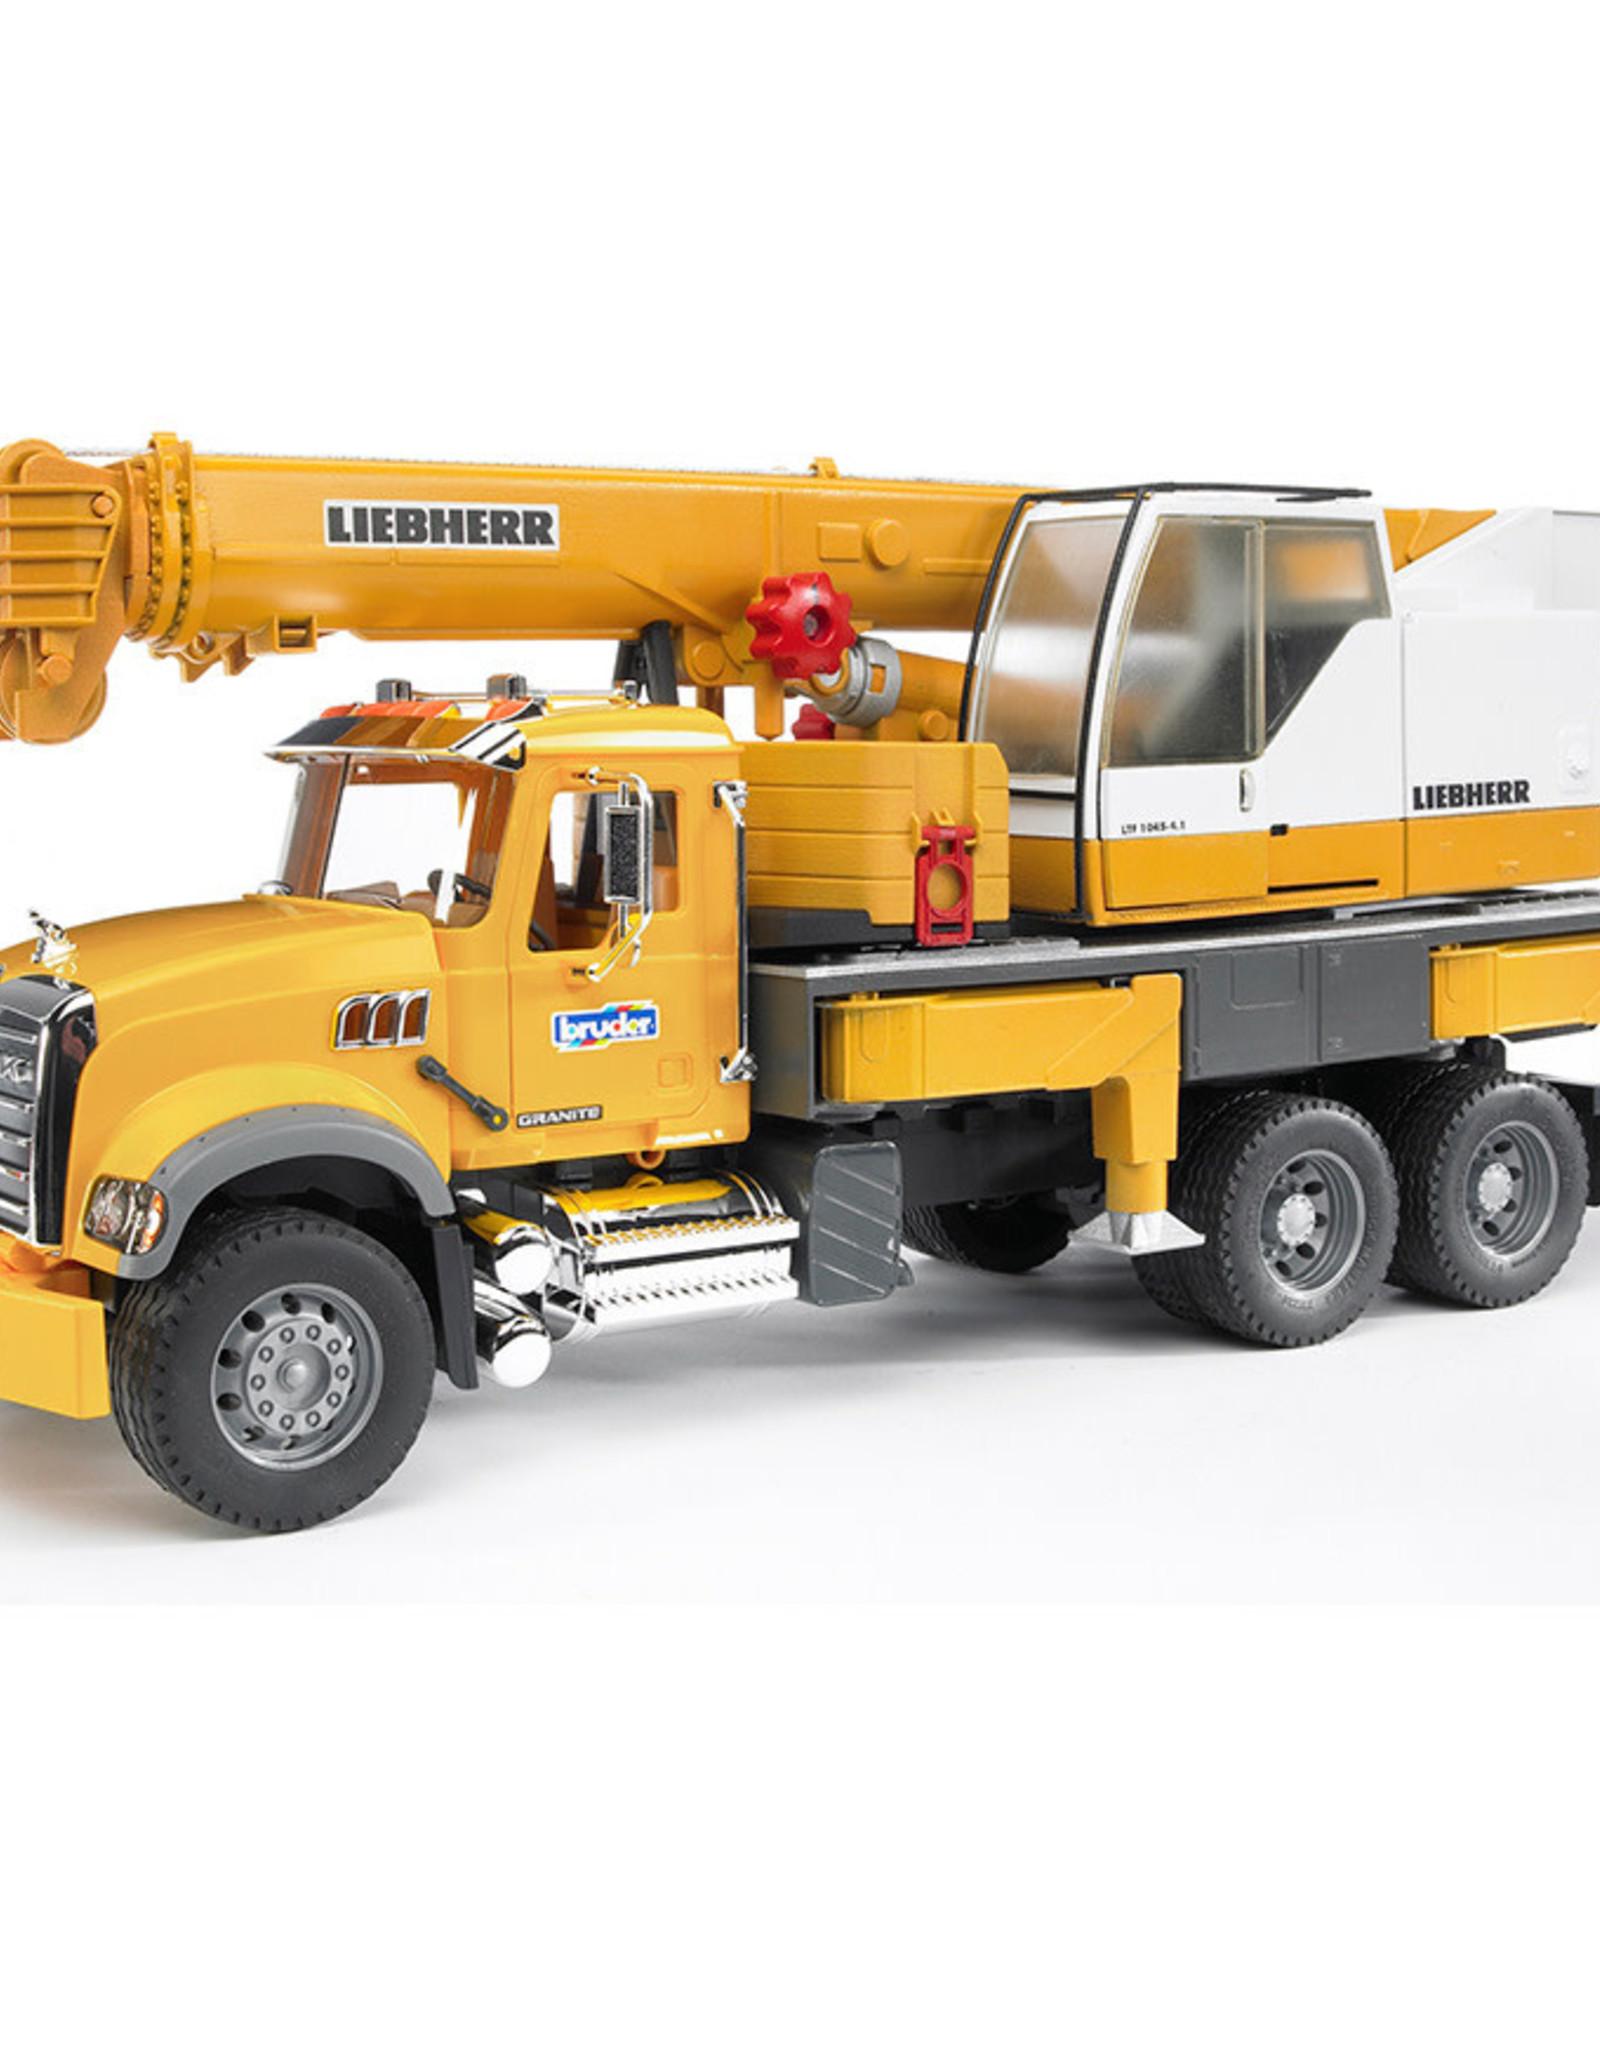 Mack Granite Crane truck